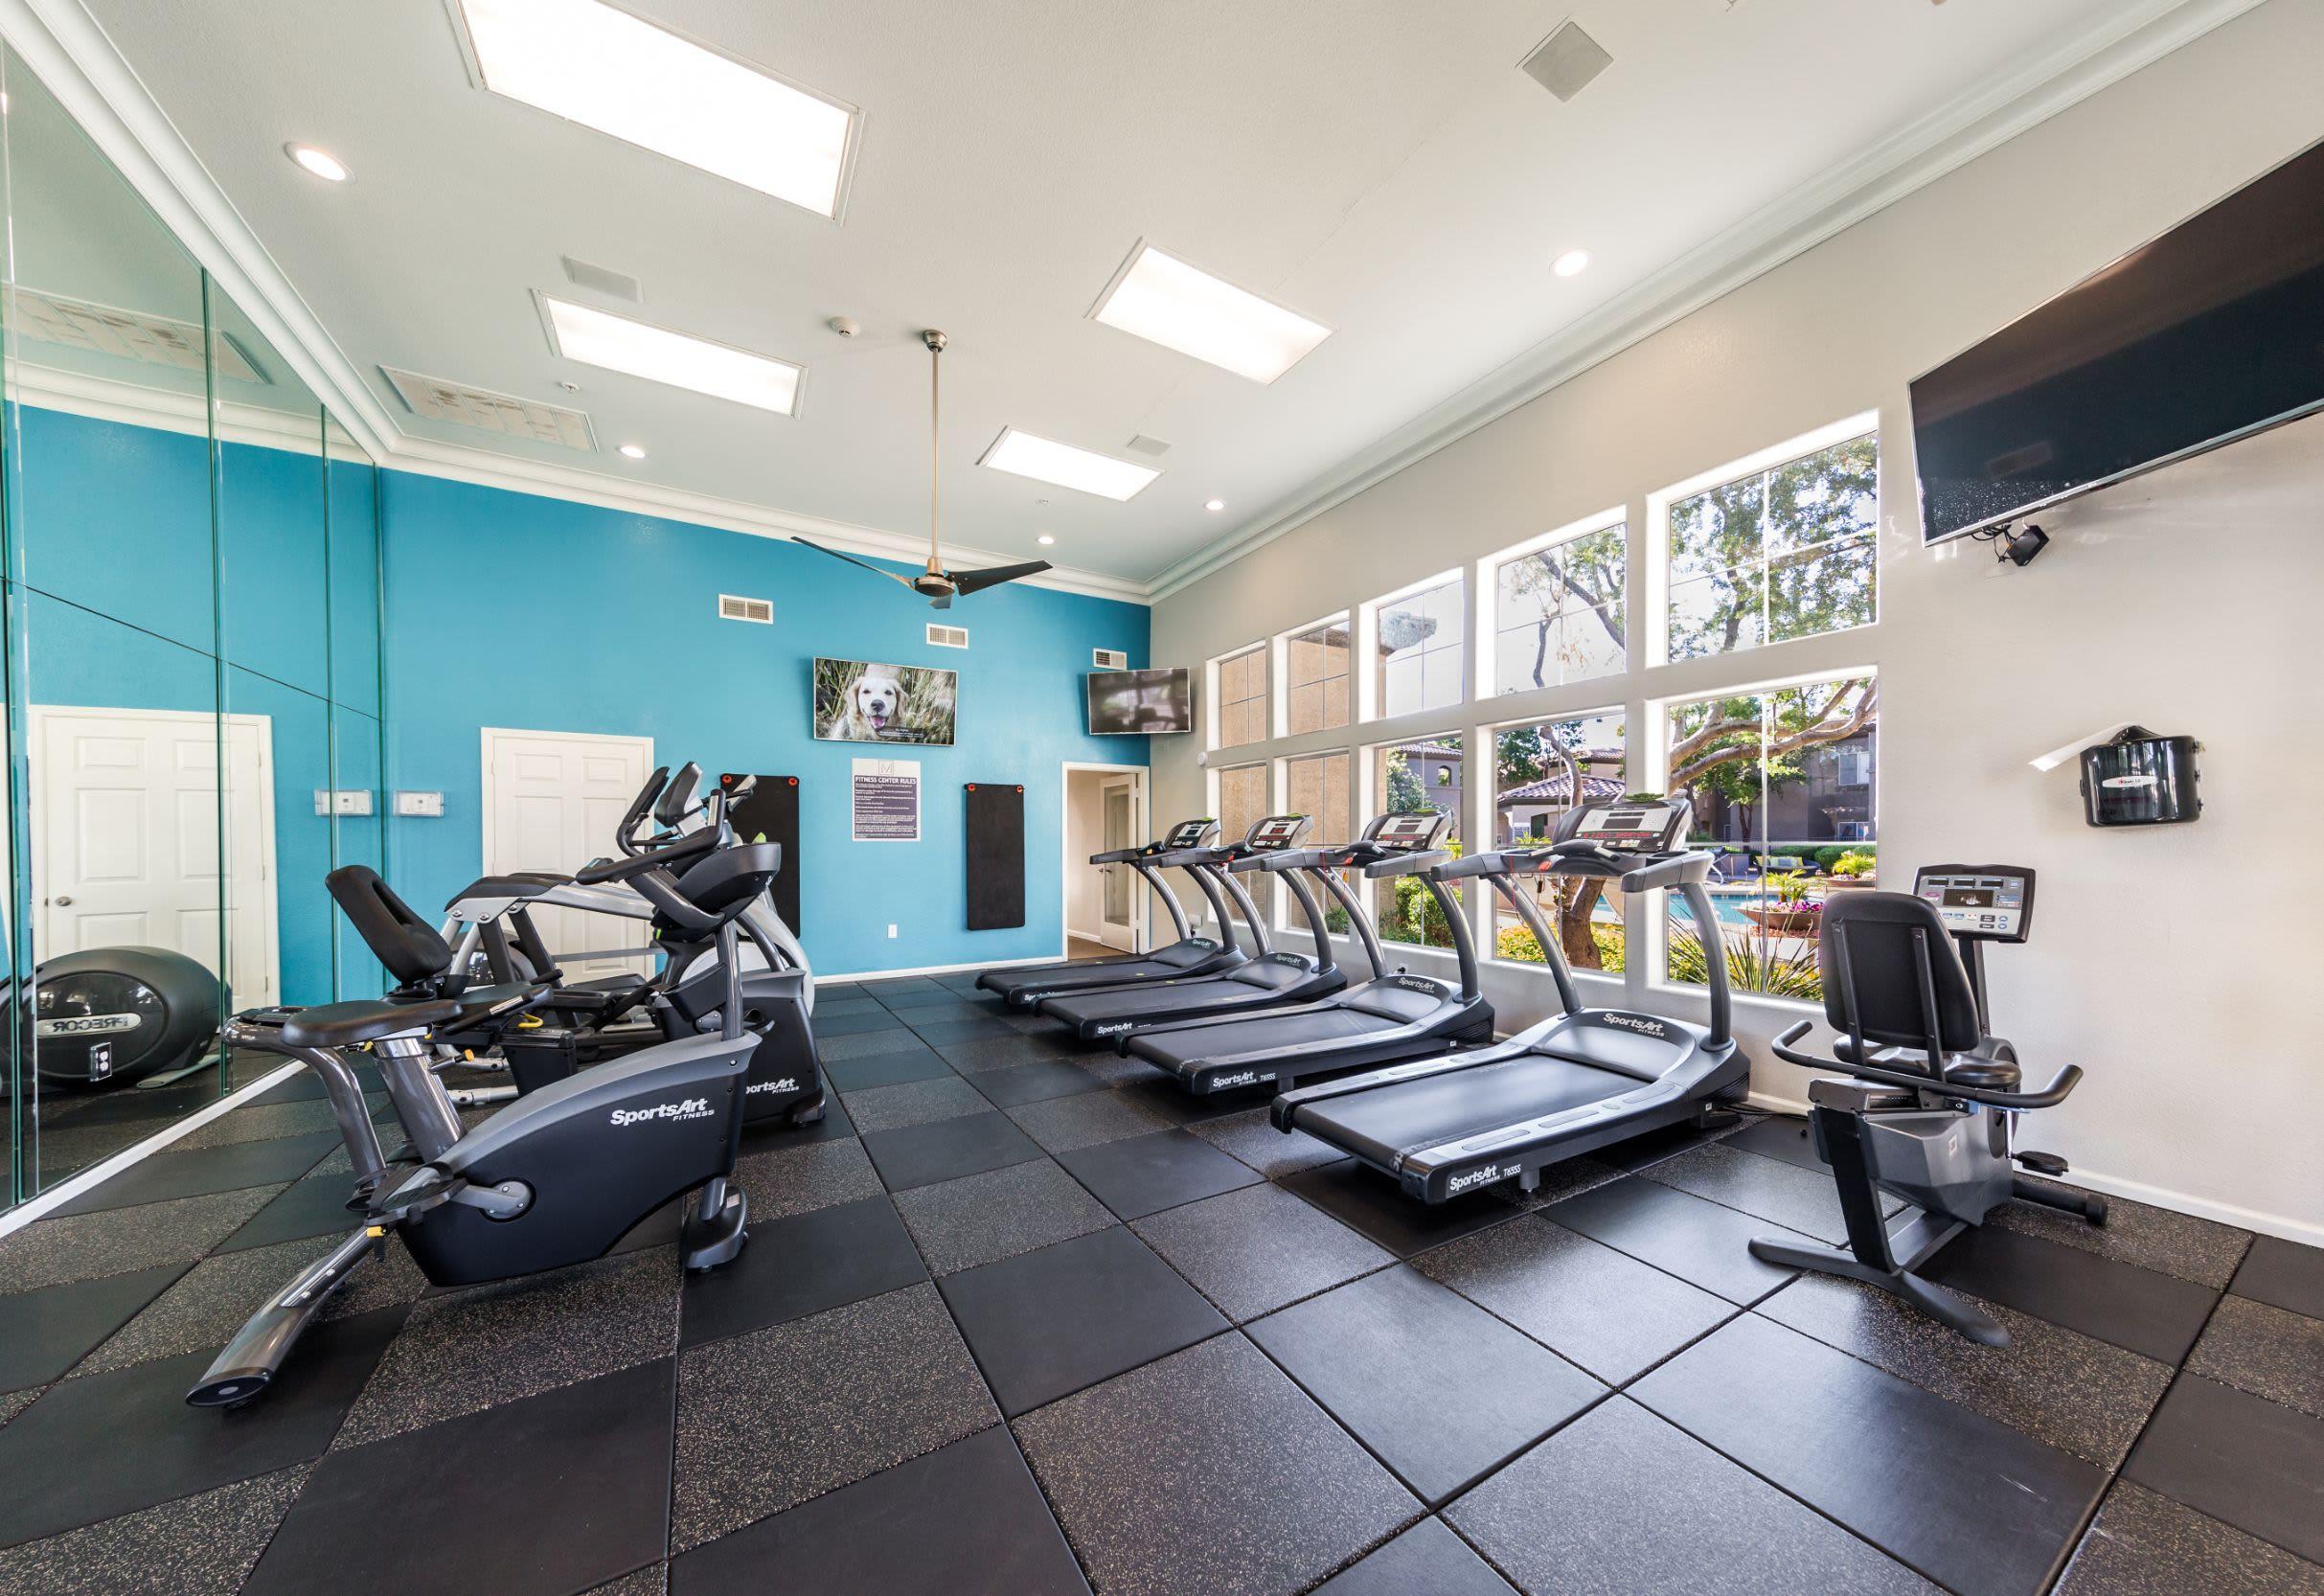 Cardio machines in fitness center at Marquis at Arrowhead in Peoria, Arizona